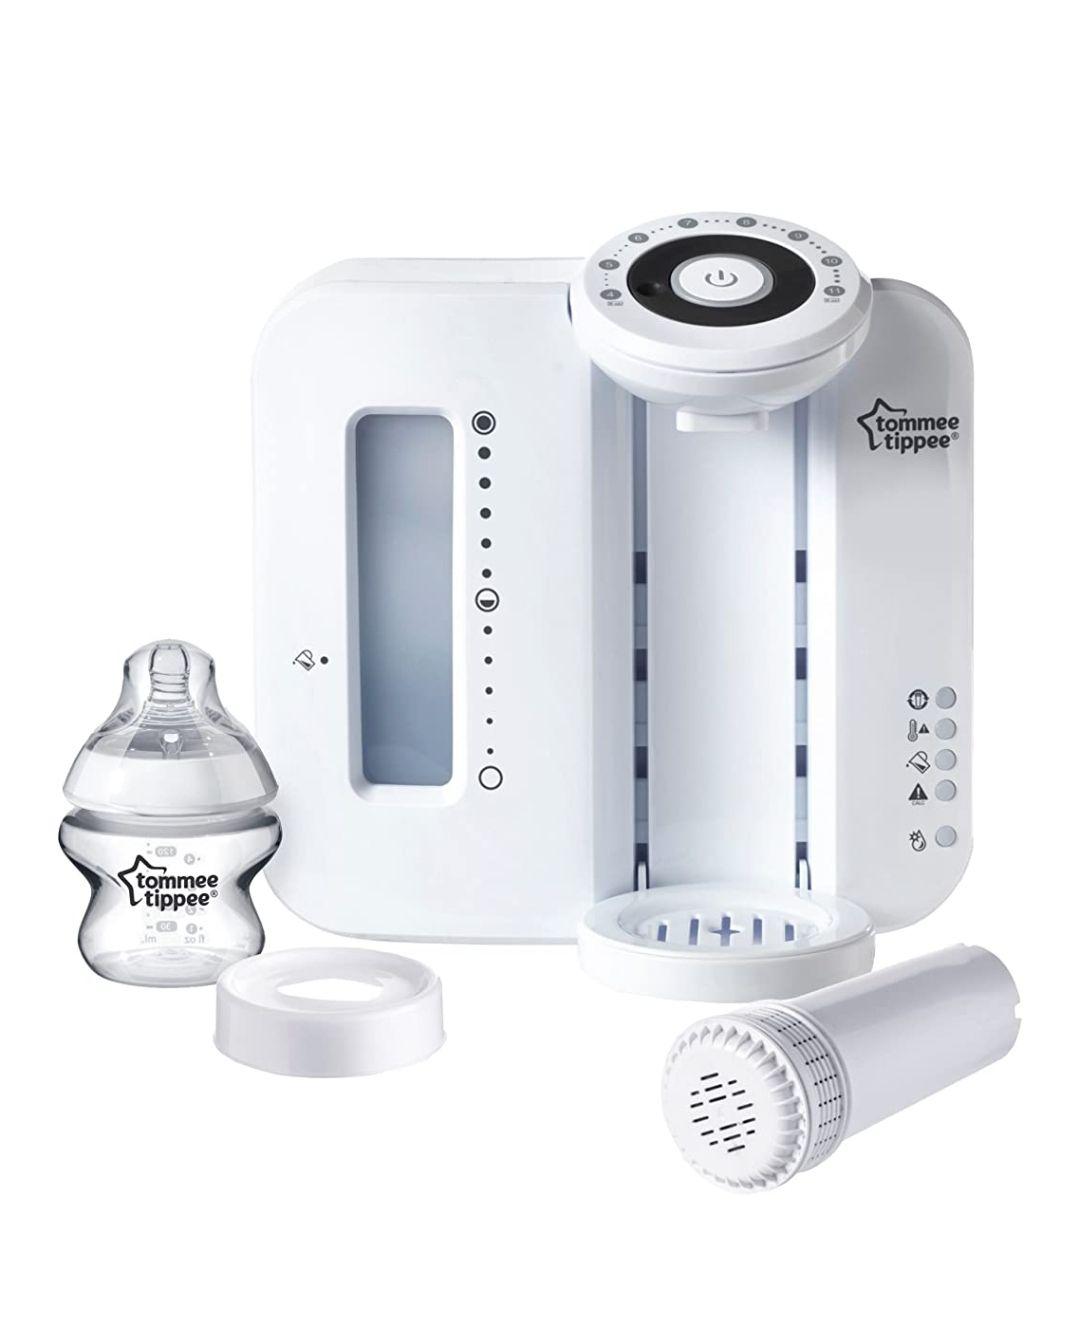 Tommee Tippee Perfect Prep Machine, White £59.99 @ Amazon